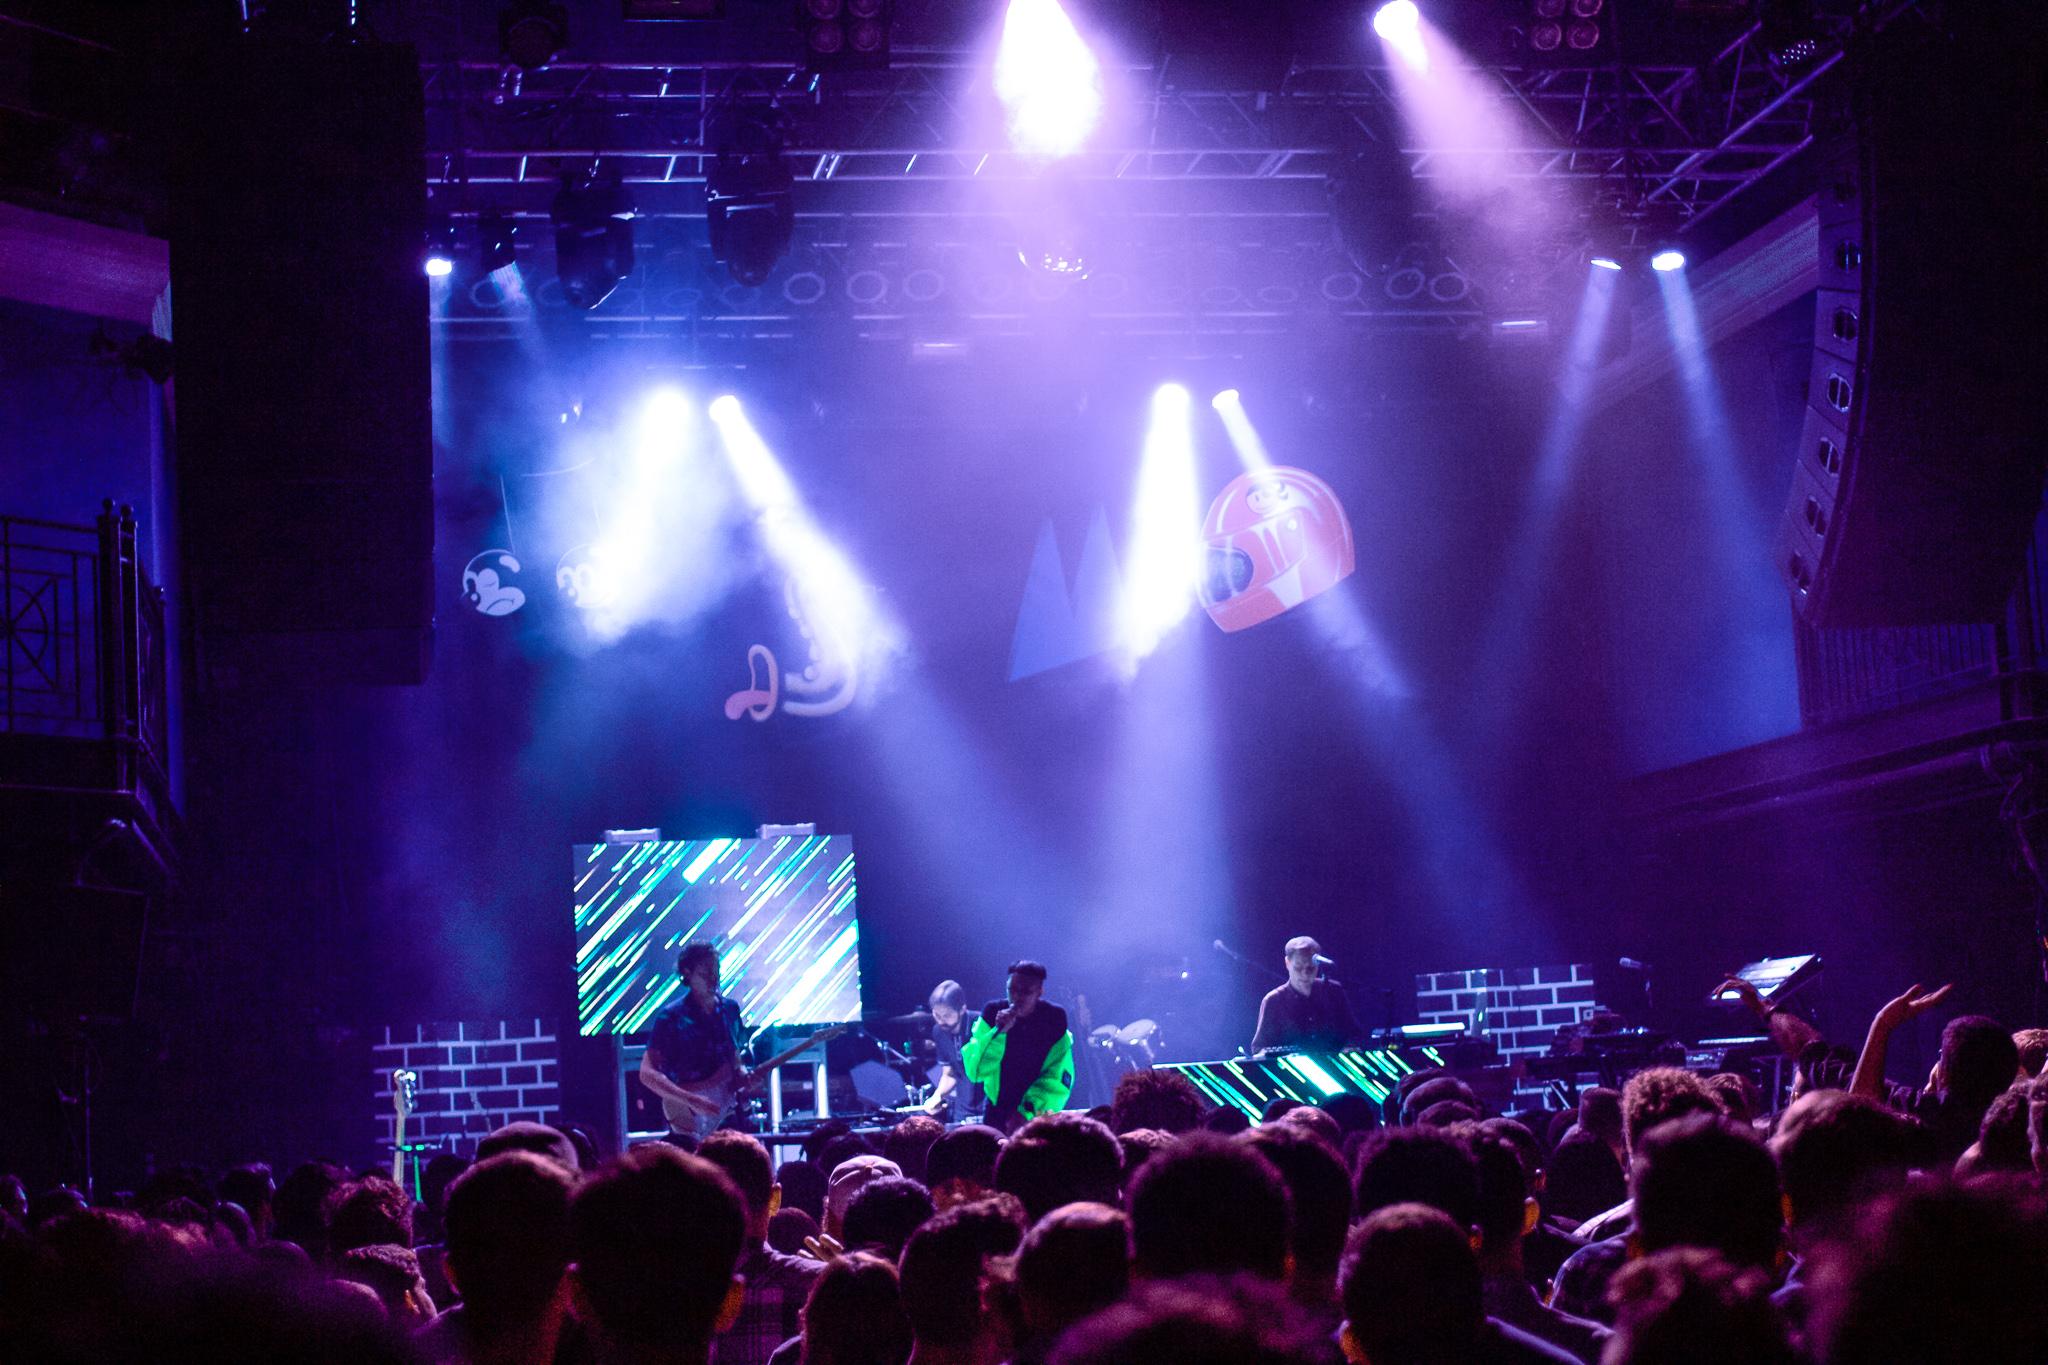 CLASSIXX playing at 9:30 Club in DC. PC: Naomi Folta